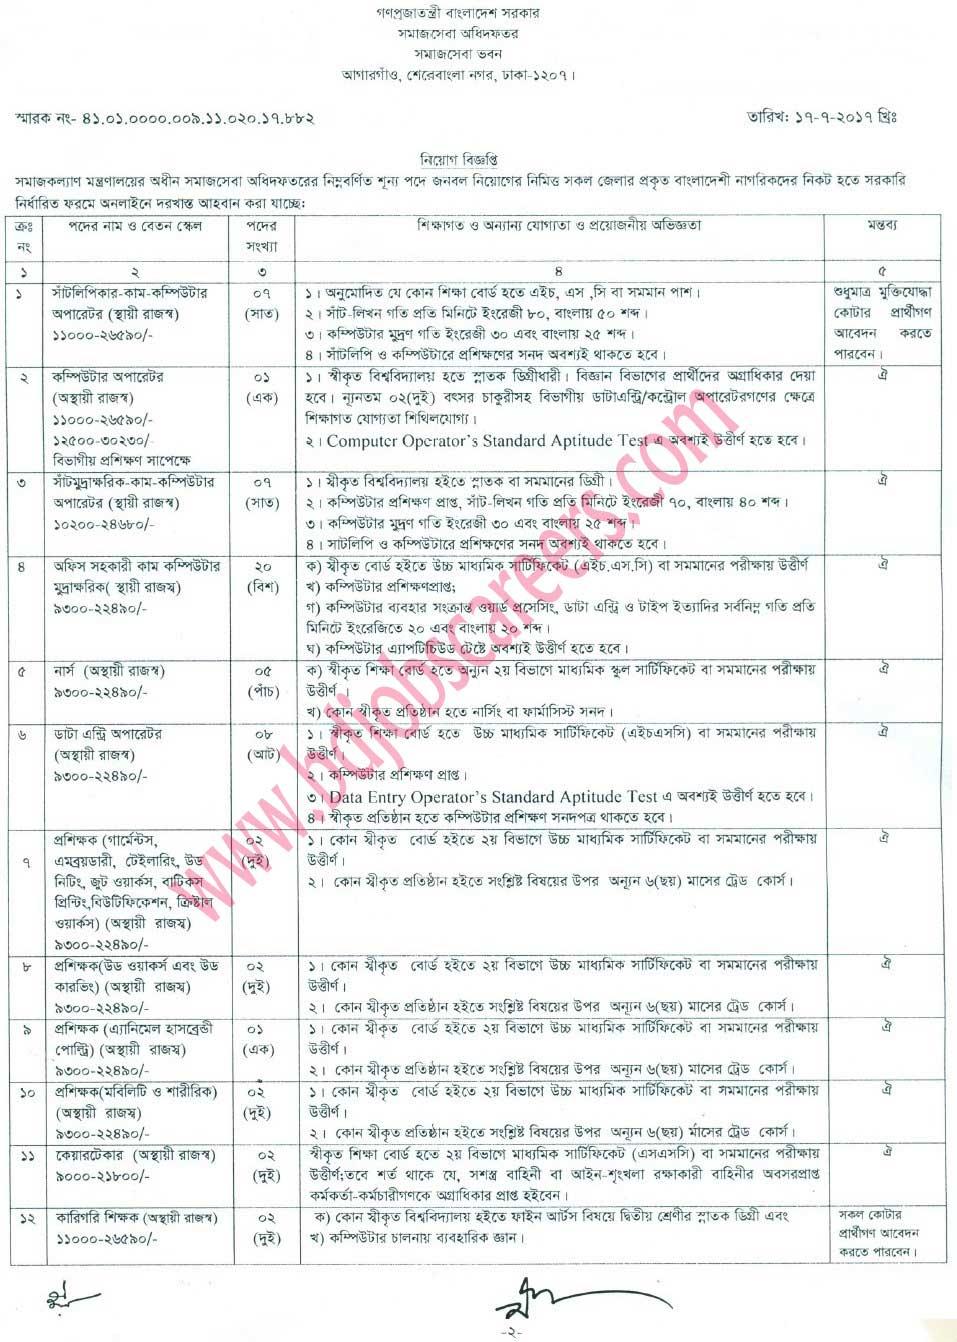 Department of social services Job Circular 2017